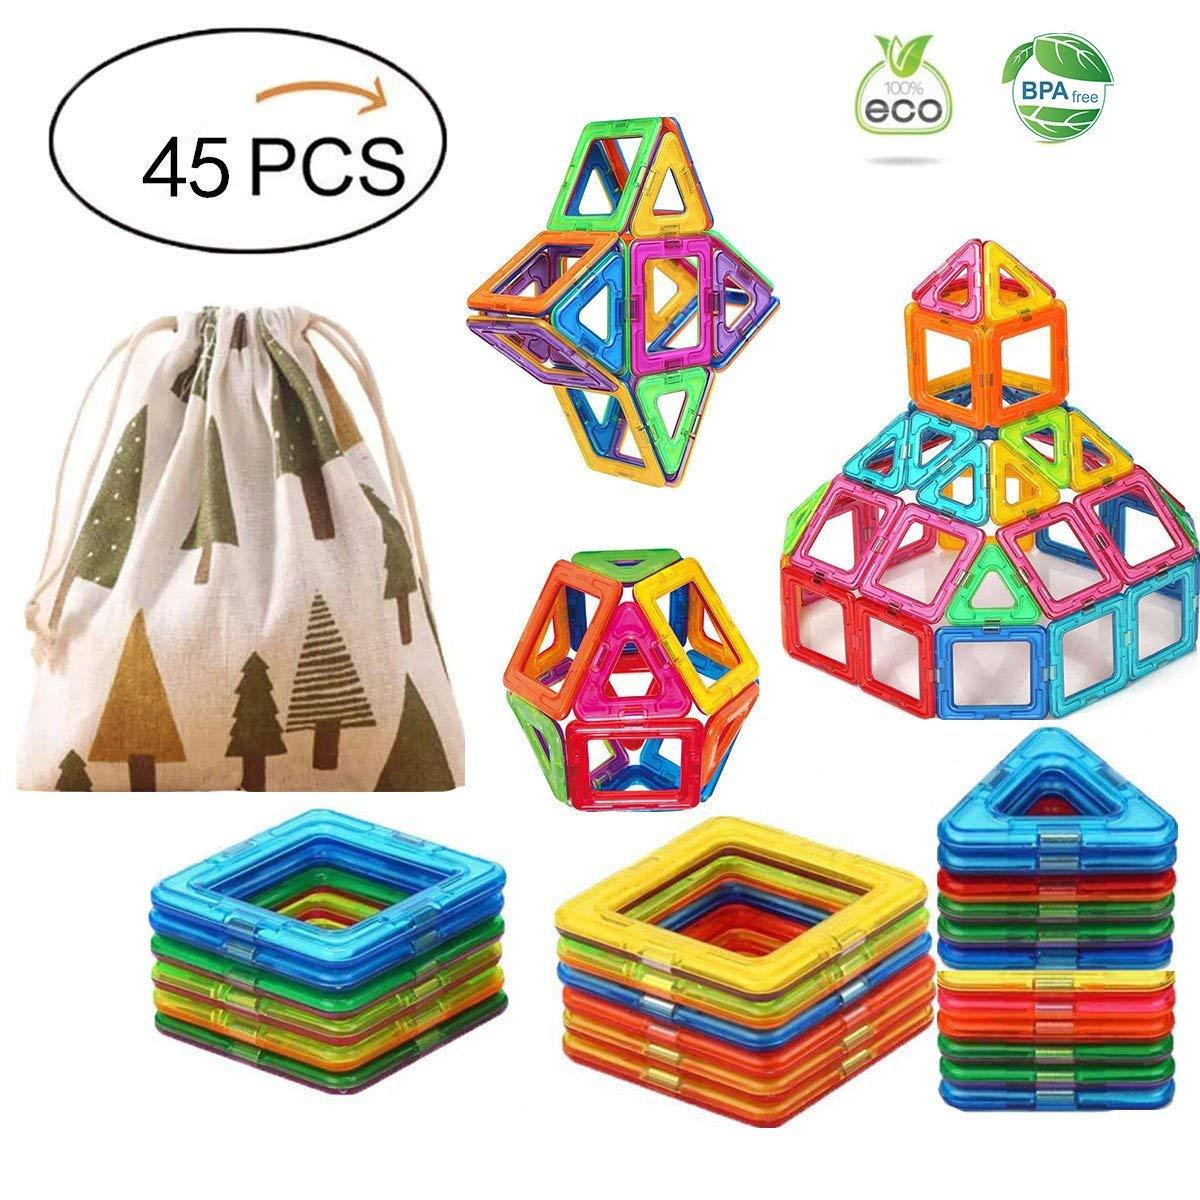 5624e92f1850 Get Quotations · Magnetic Building Blocks 3D Tiles Block Educational Toys  Sets for Kids - 45Pcs